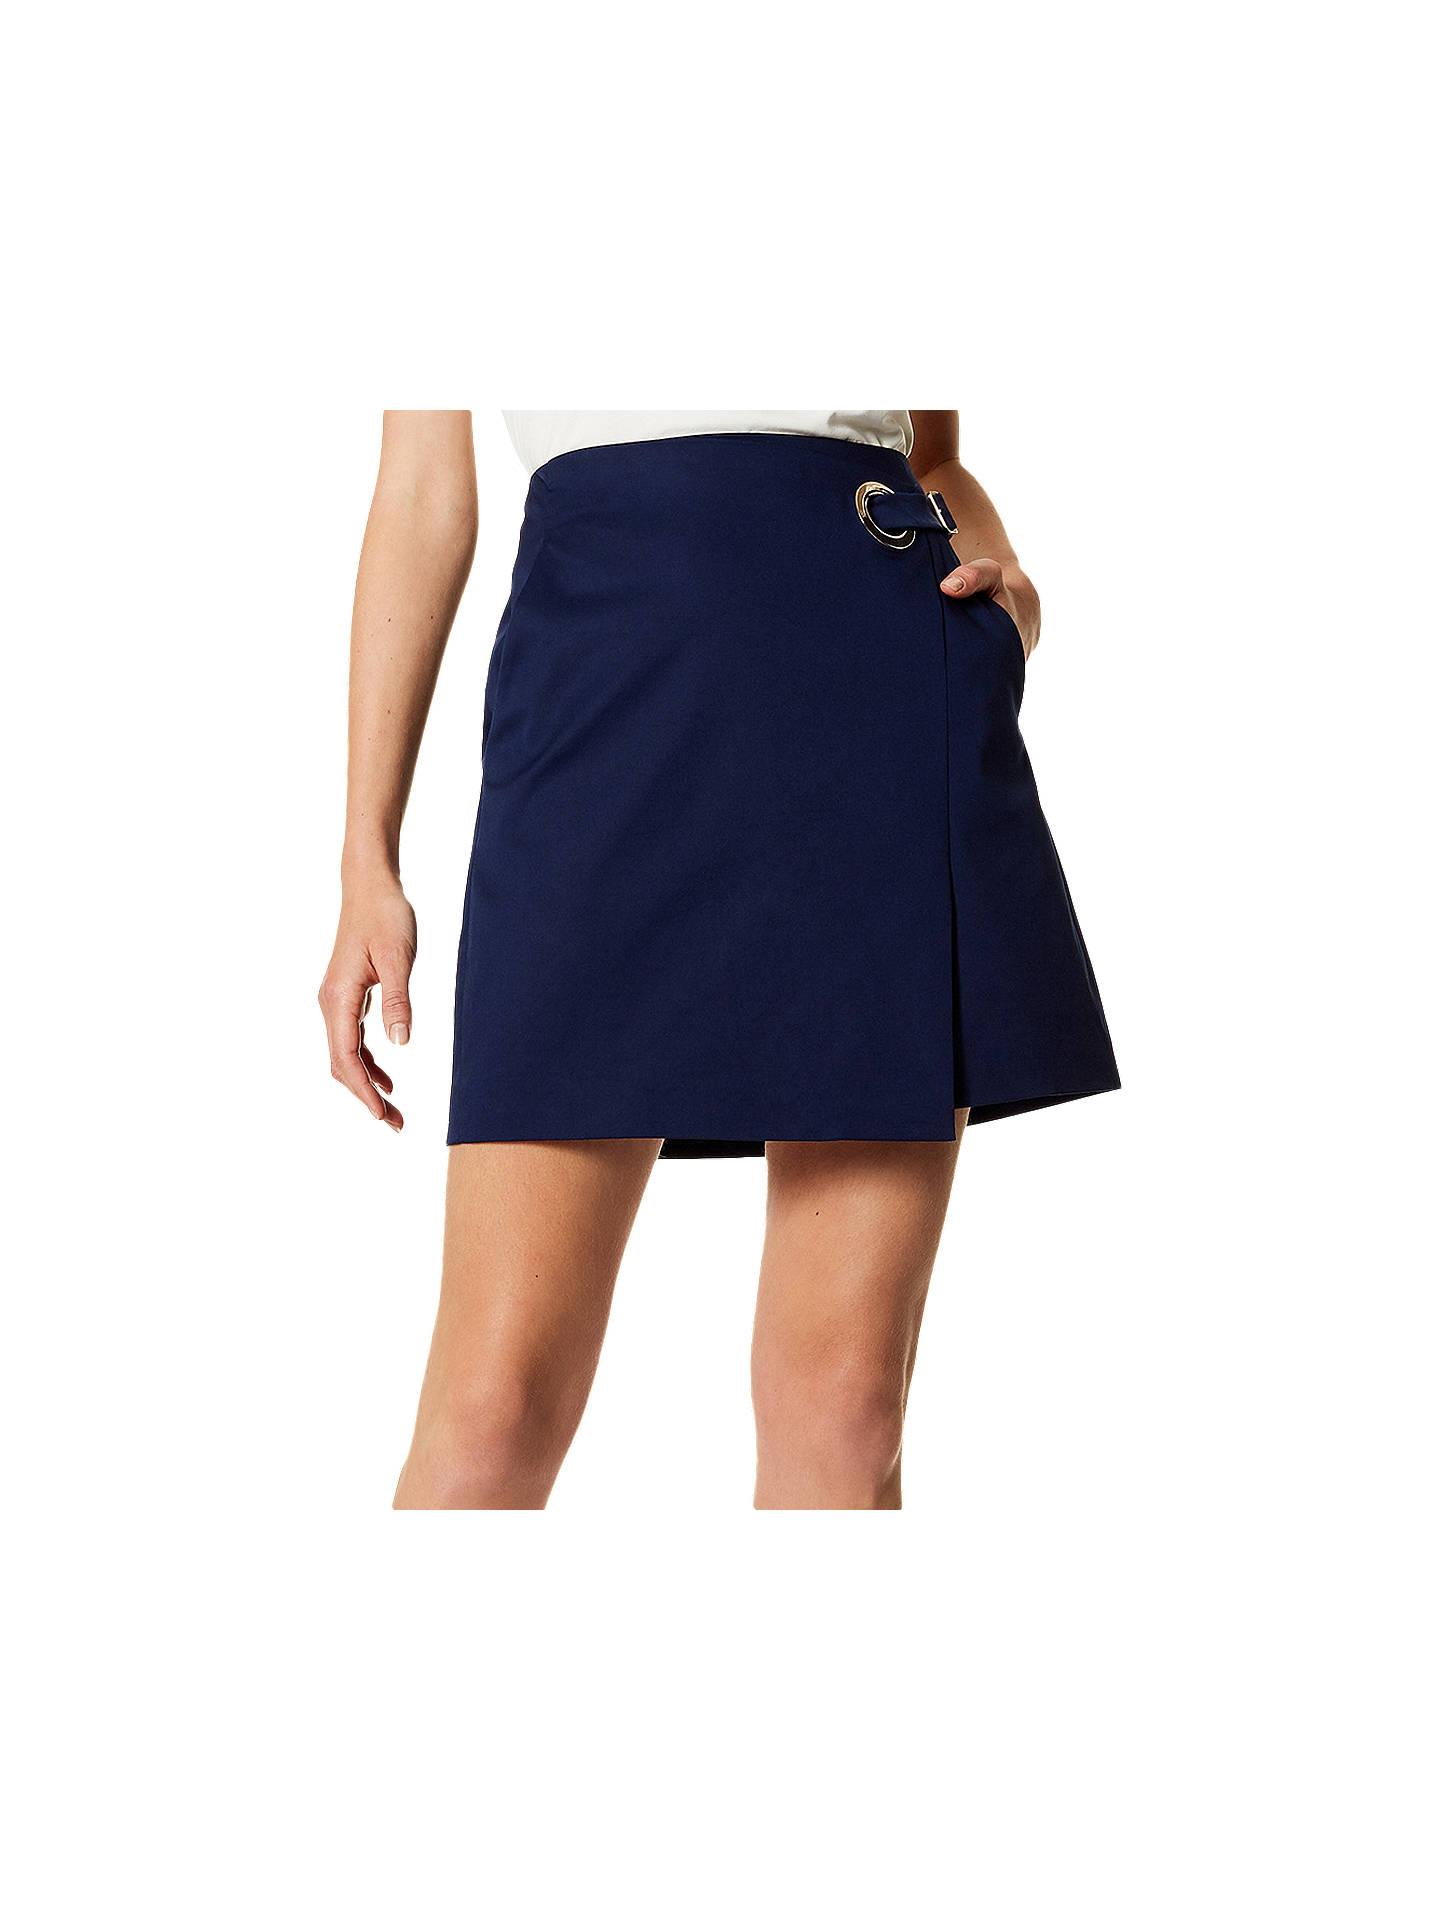 101a89b689 Buy Karen Millen Eyelet Wrap Skirt, Navy, 6 Online at johnlewis.com ...